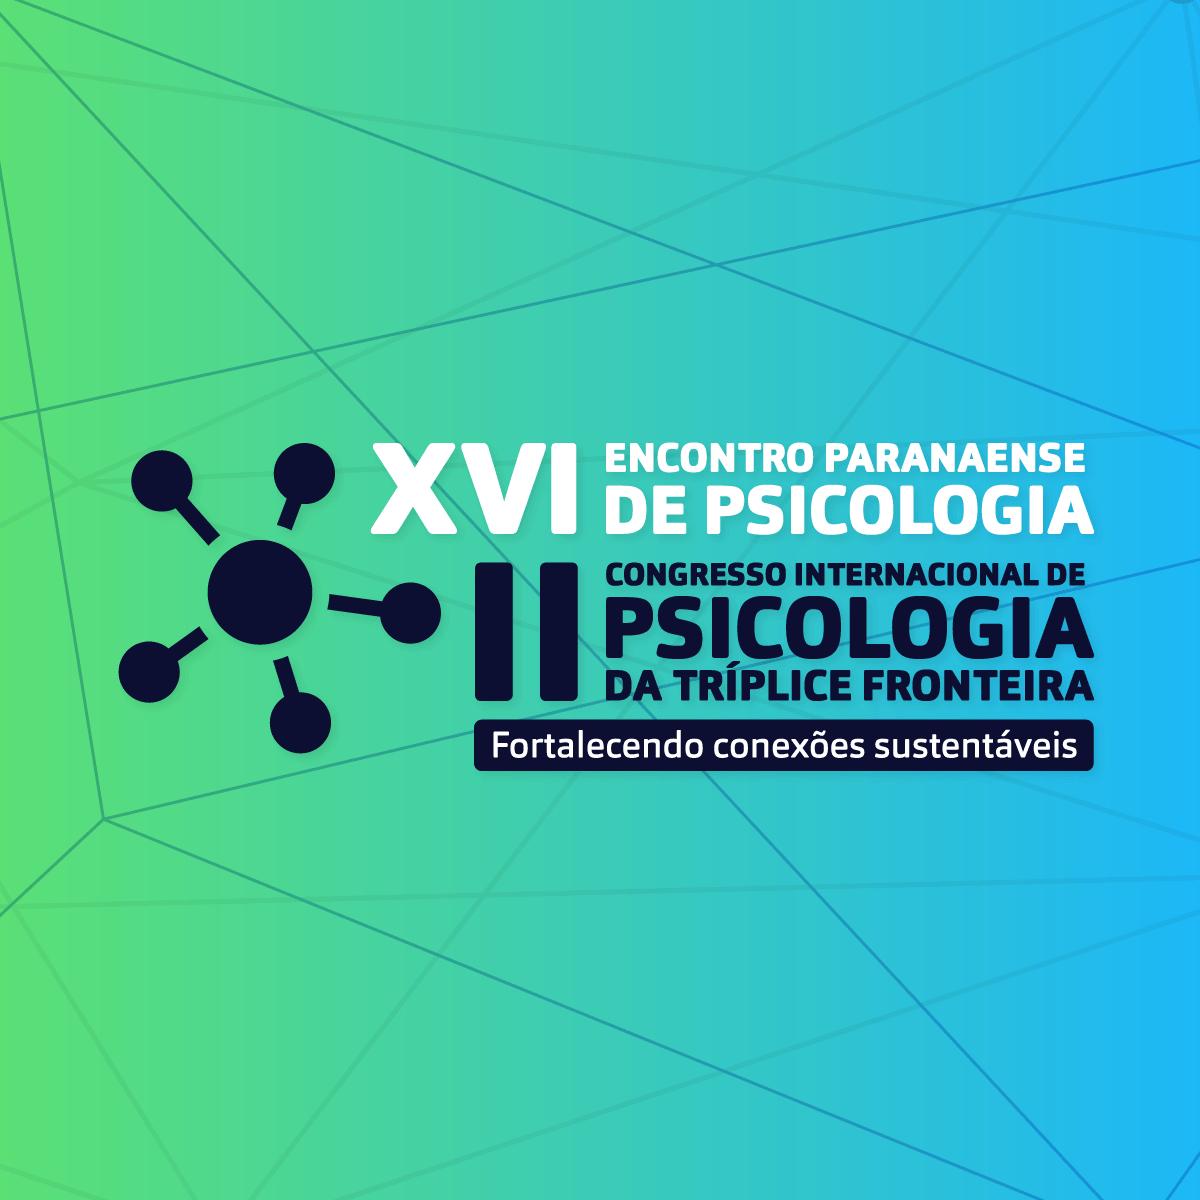 XVI Encontro Paranaense de Psicologia e II Congresso Internacional de Psicologia da Tríplice Fronteira